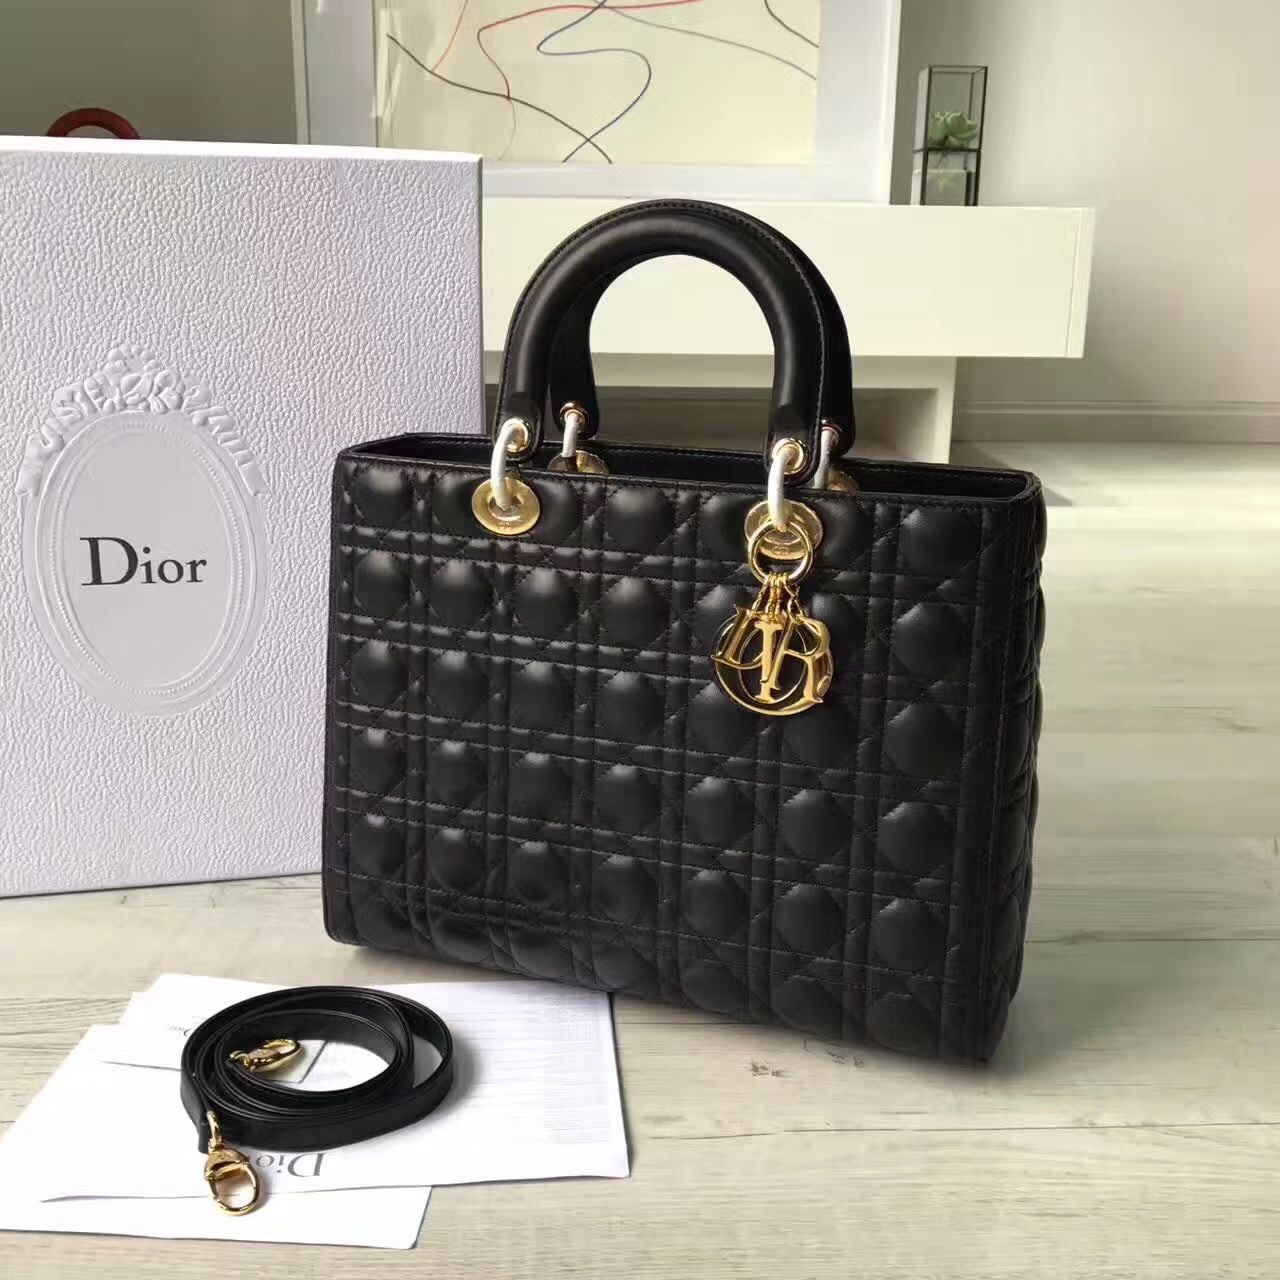 Christian Dior CD woman bag original leather version lady Dior large size